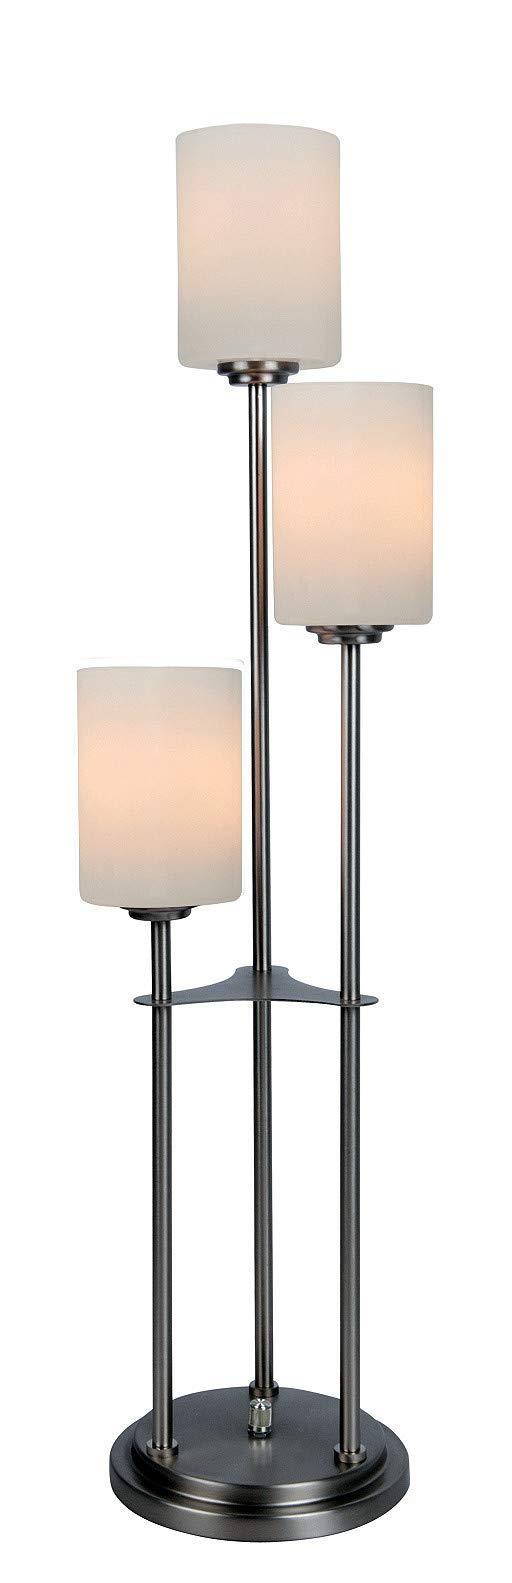 Lite Source LSF-20700BN Candelabra Shade Decor Lamp by Lite Source